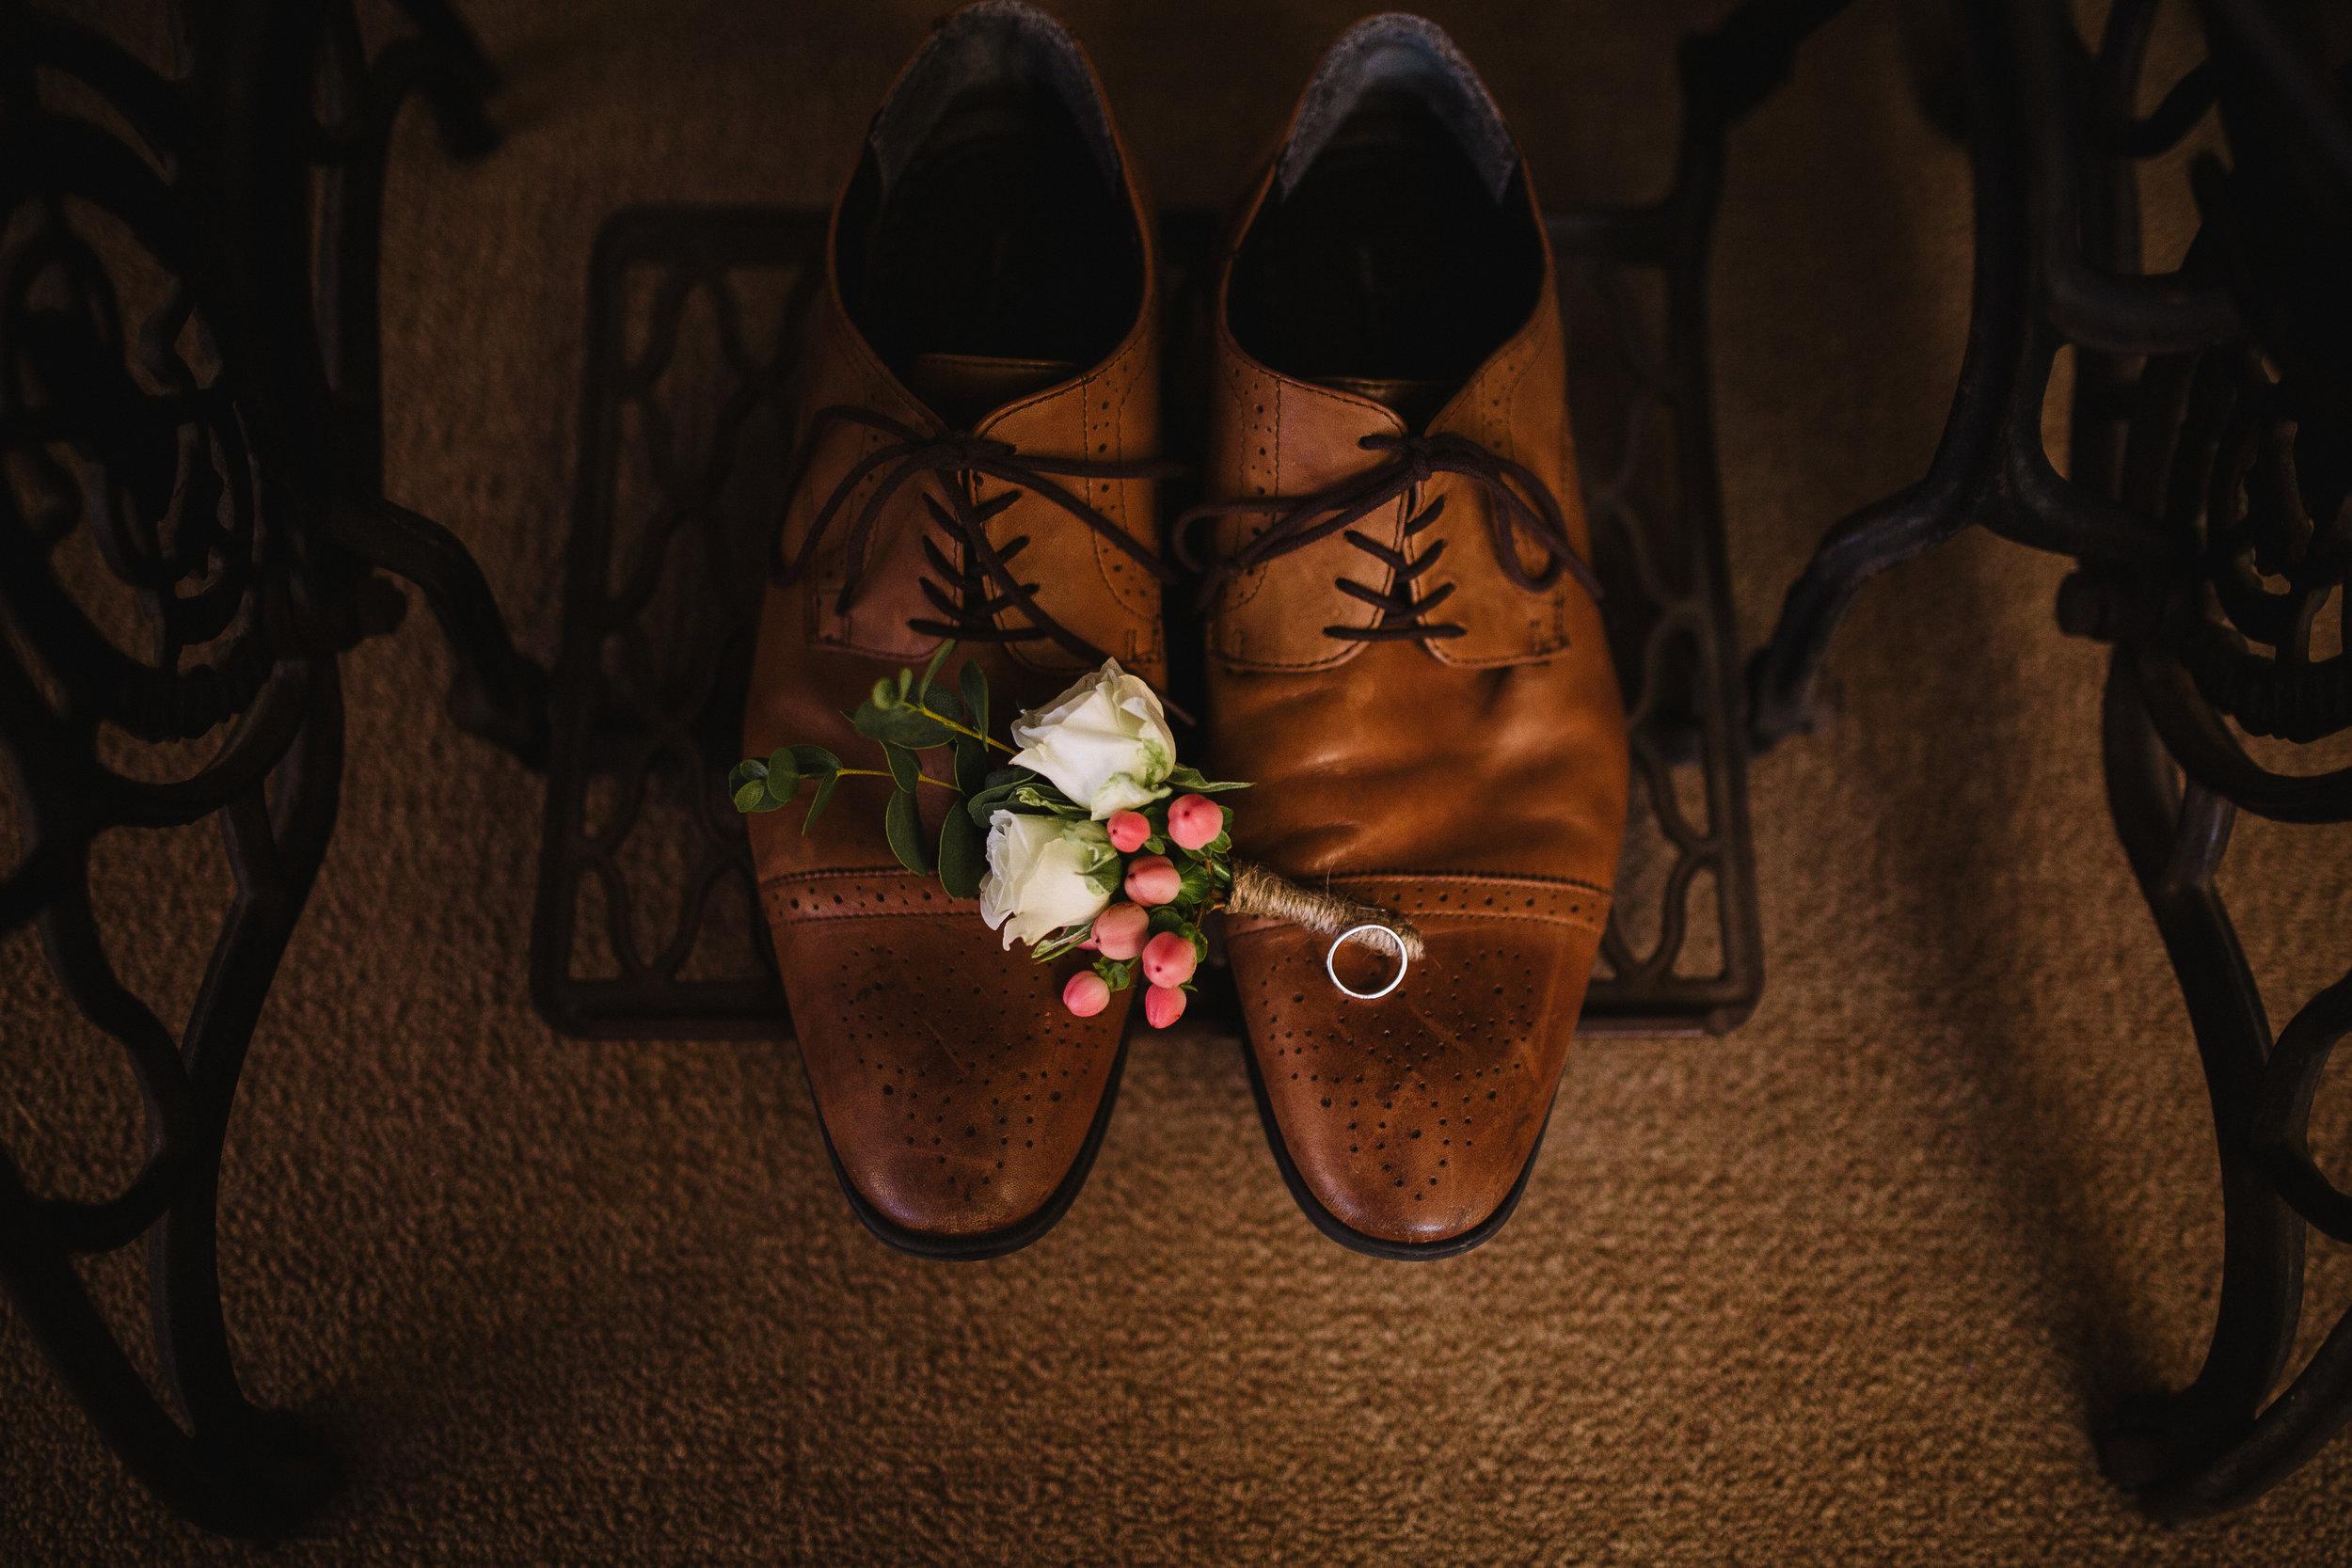 TRADITIONAL-WEDDING-PATTERNMAGAZINE-REAGANLYNNPHOTOGRAPHY-INDIANAPOLIS-INDIANA-12.jpg